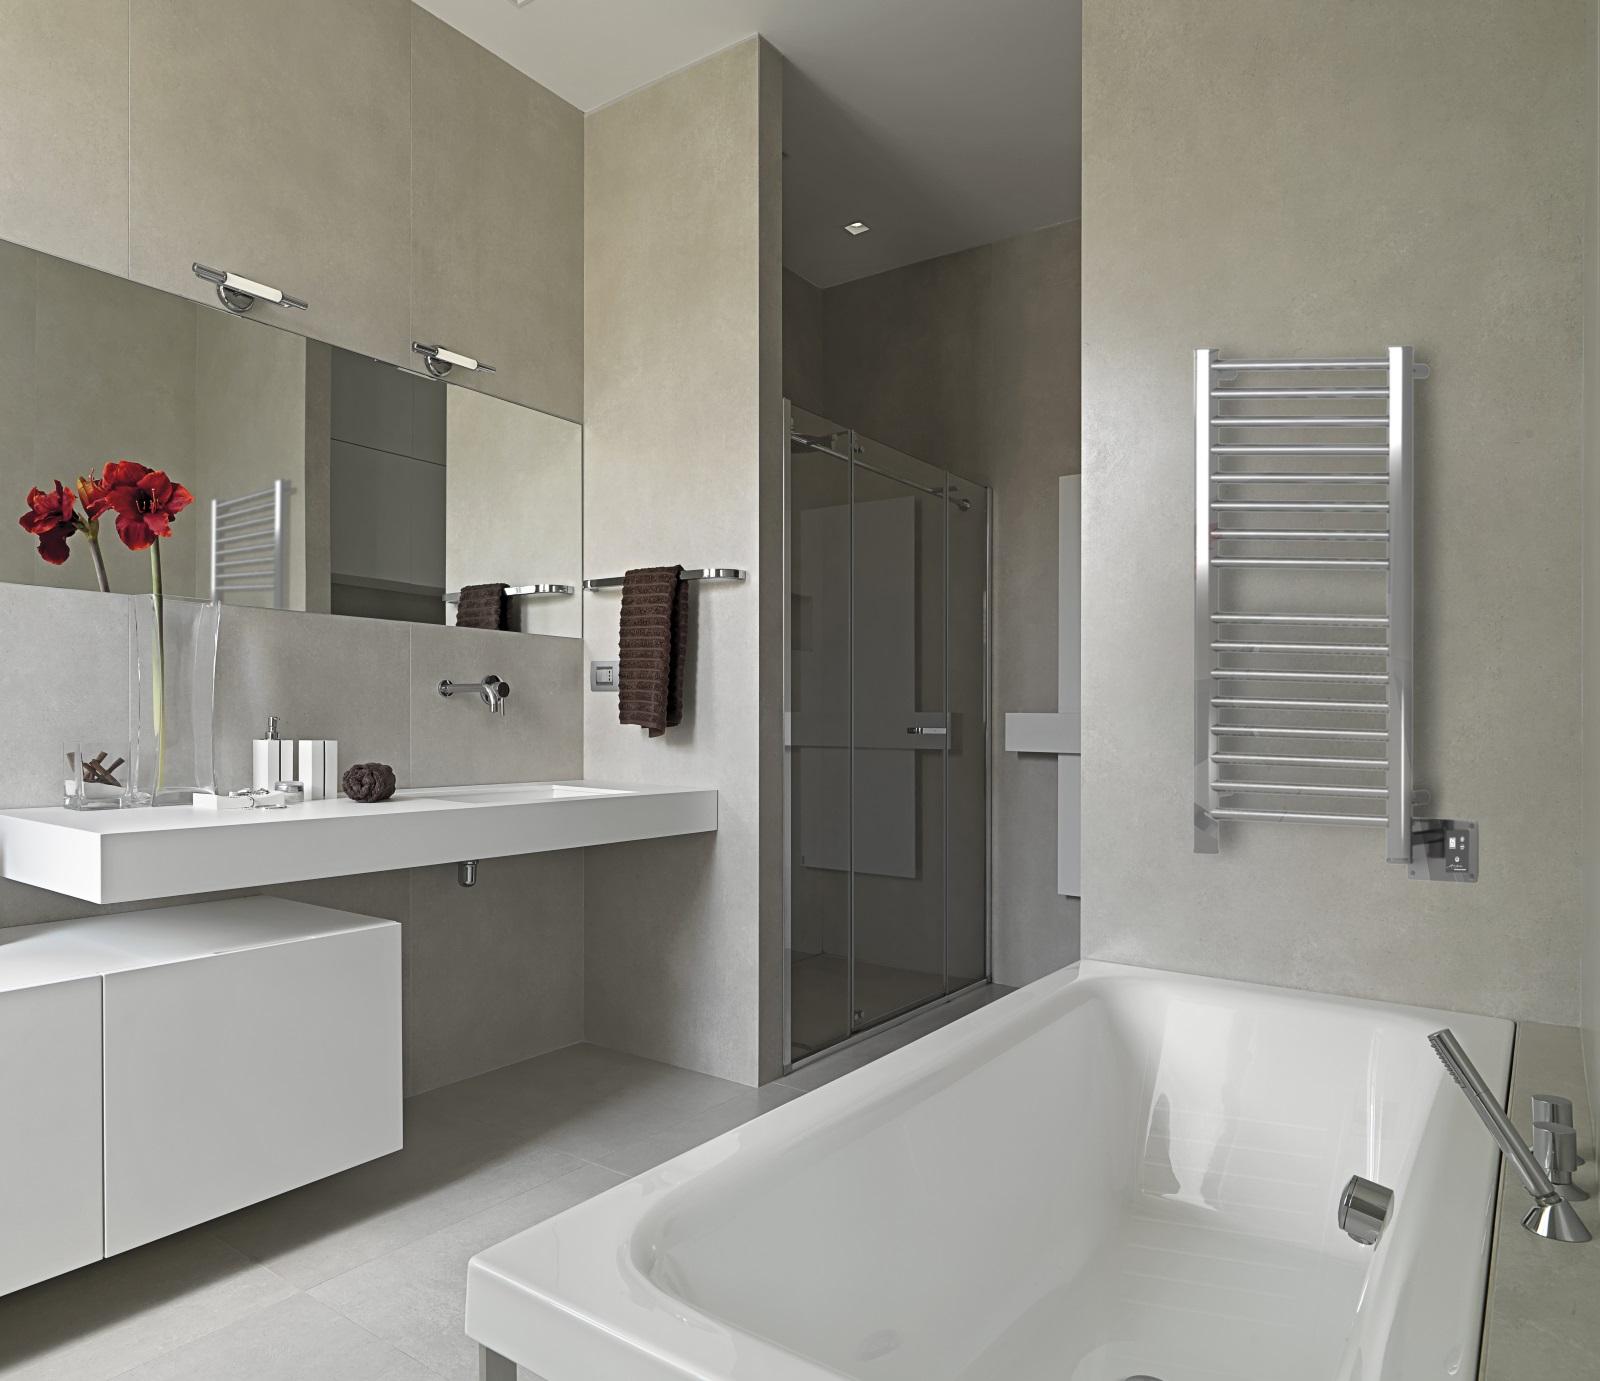 Amba Towel Warmers | Hydronic Towel Warmers | Cordless Towel Warmer